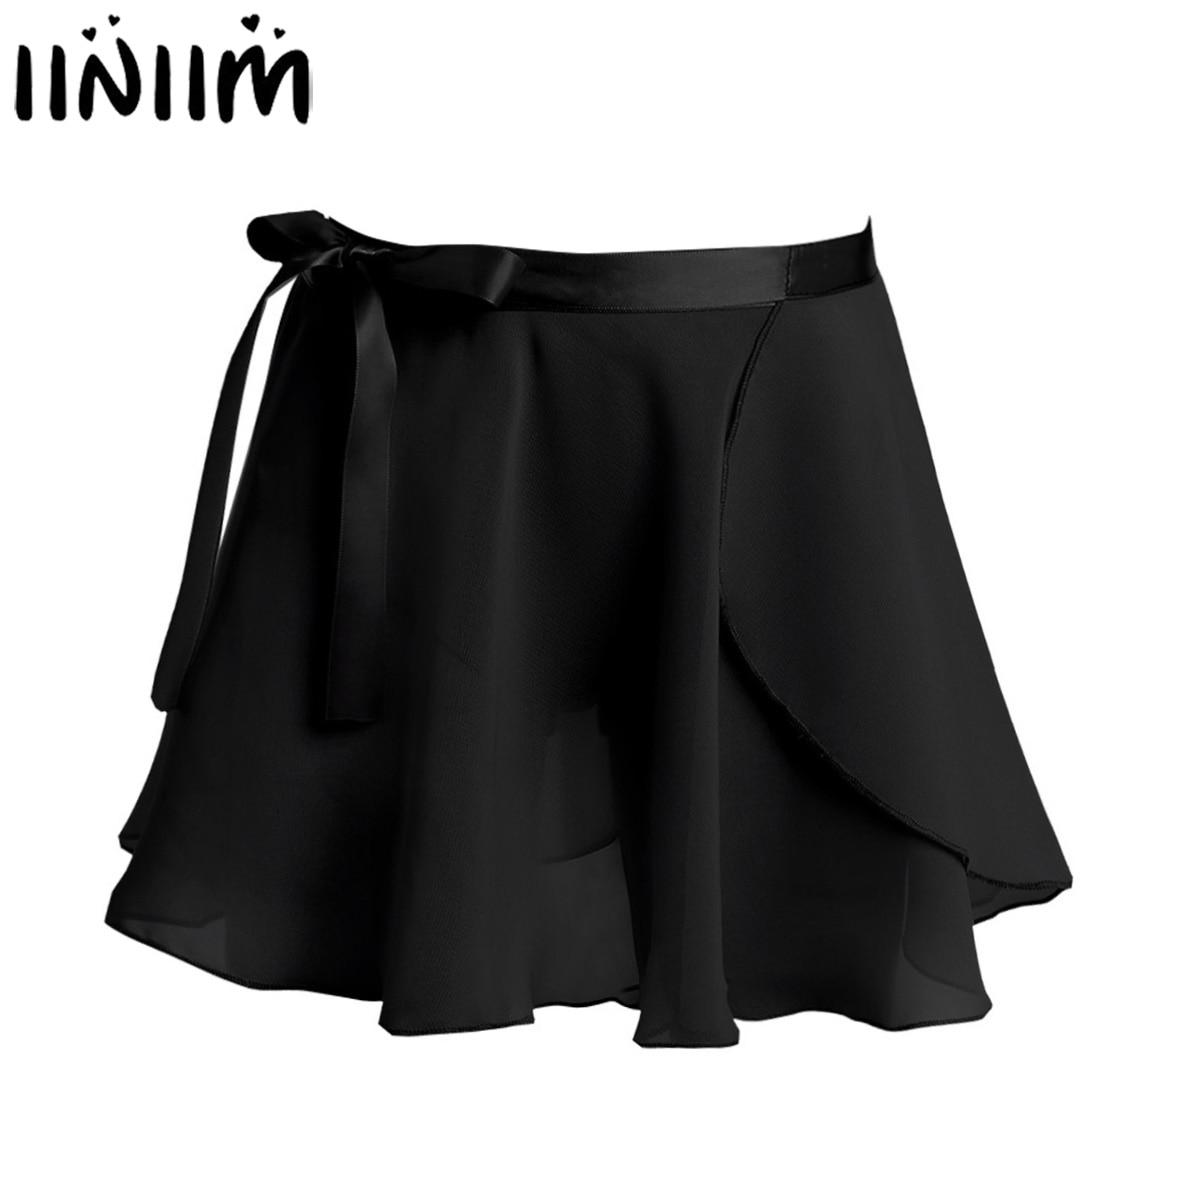 Kids Girls Gymnastics Leotard Dance Skirt Basic Chiffon Mini Pull-On Wrap Skirt Waist Tie Costumes For Performance Dance Wear